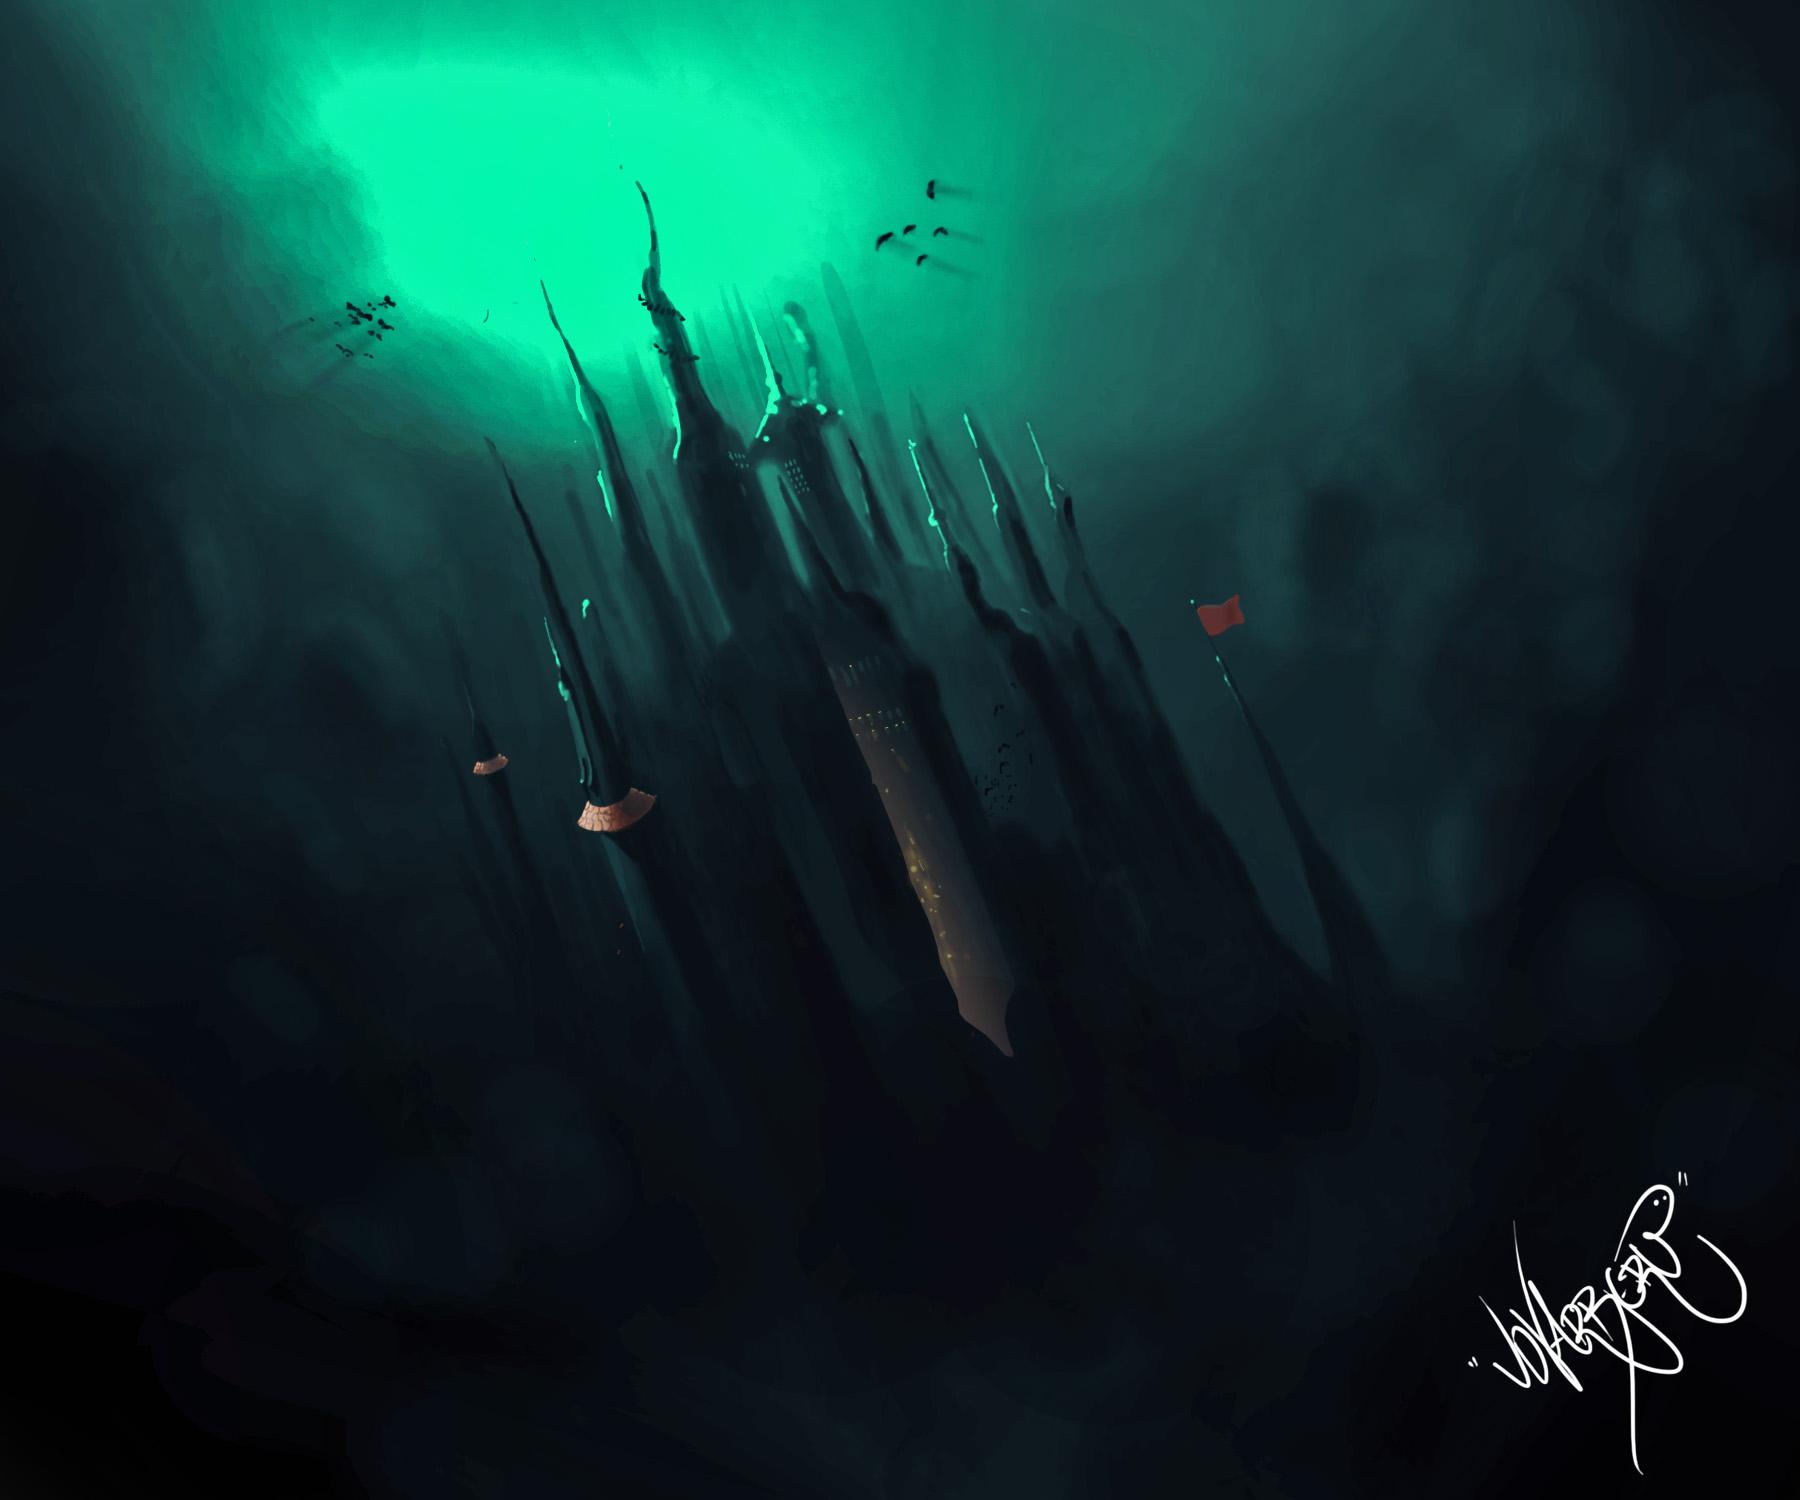 castle of the doom